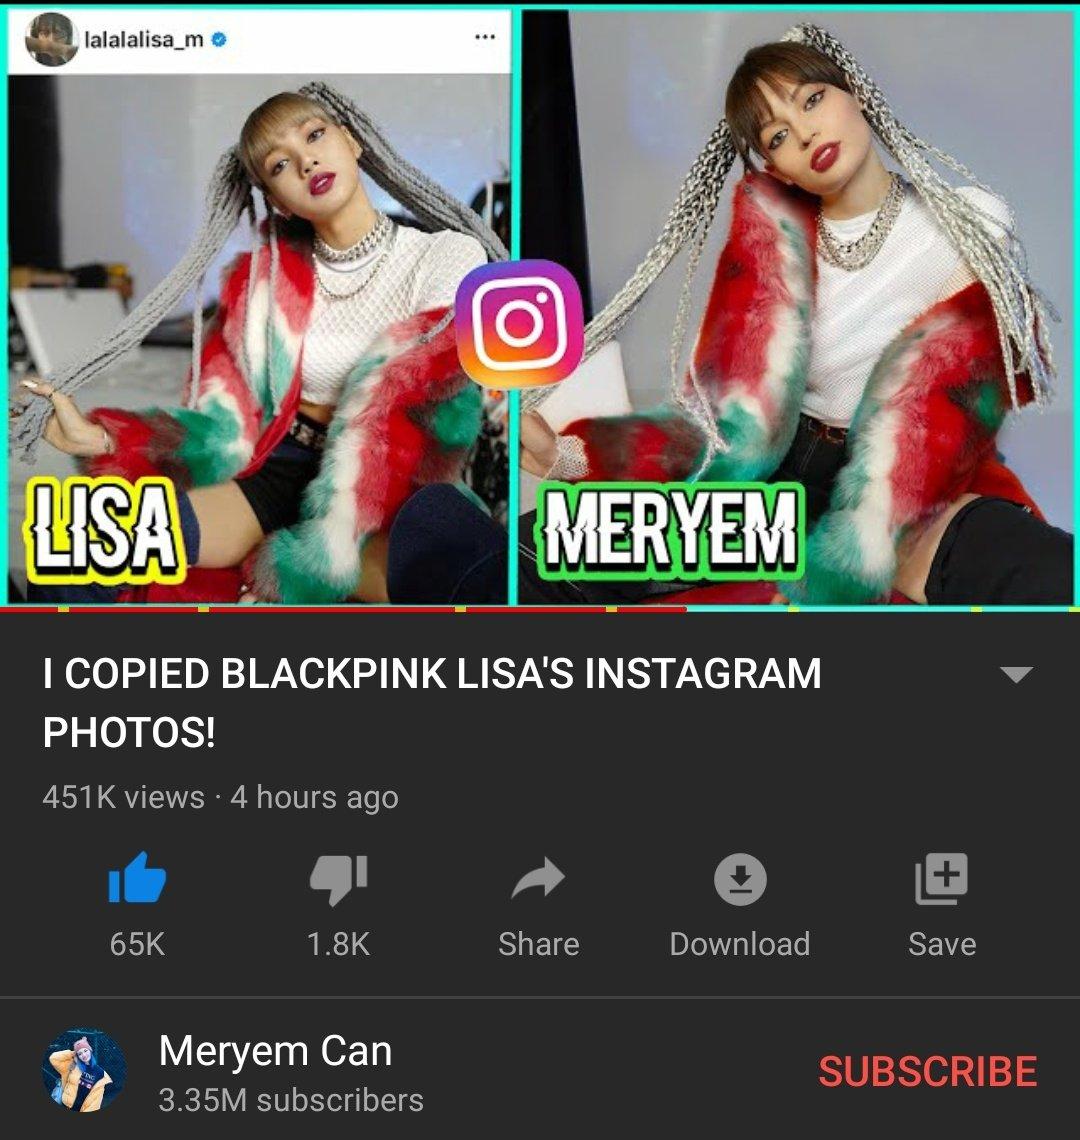 Meryem Can ( A famous Turkish YouTuber with 3.35M ) has posted a video where she copied Lisa's Instagram photo styles ❤  🔗   قامت اليوتيوبر التركية الشهيرة مريم كان بنشر فيديو لها وهي تقوم بتقليد أزياء صور ليسا من الإنستقرام ❤  #LISA #LALISA #BLACKPINK